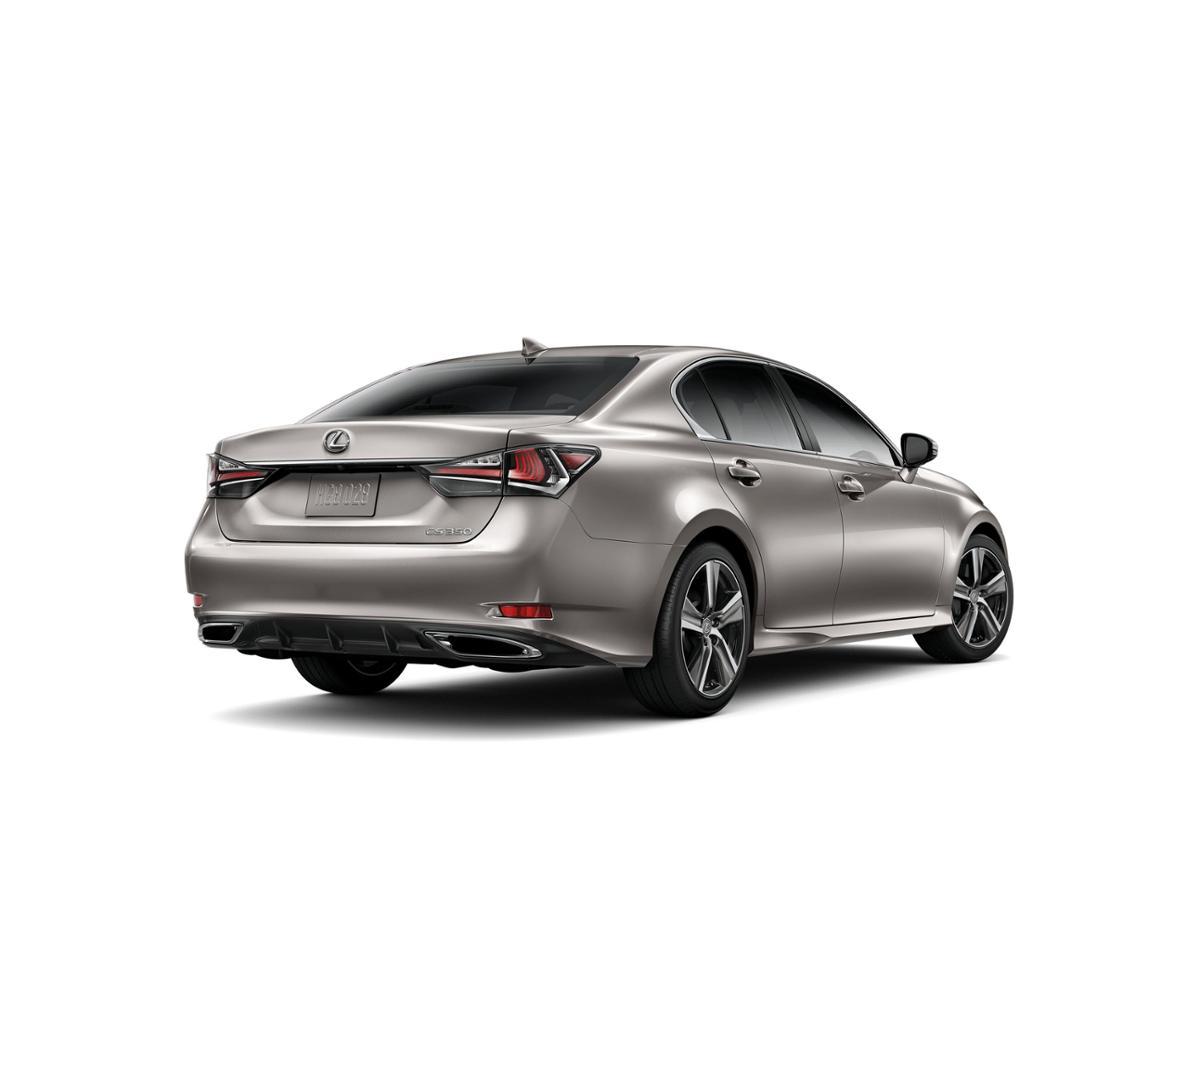 Lexus Gs For Sale: East Haven Lexus GS 350 2019 Atomic Silver: New Car For